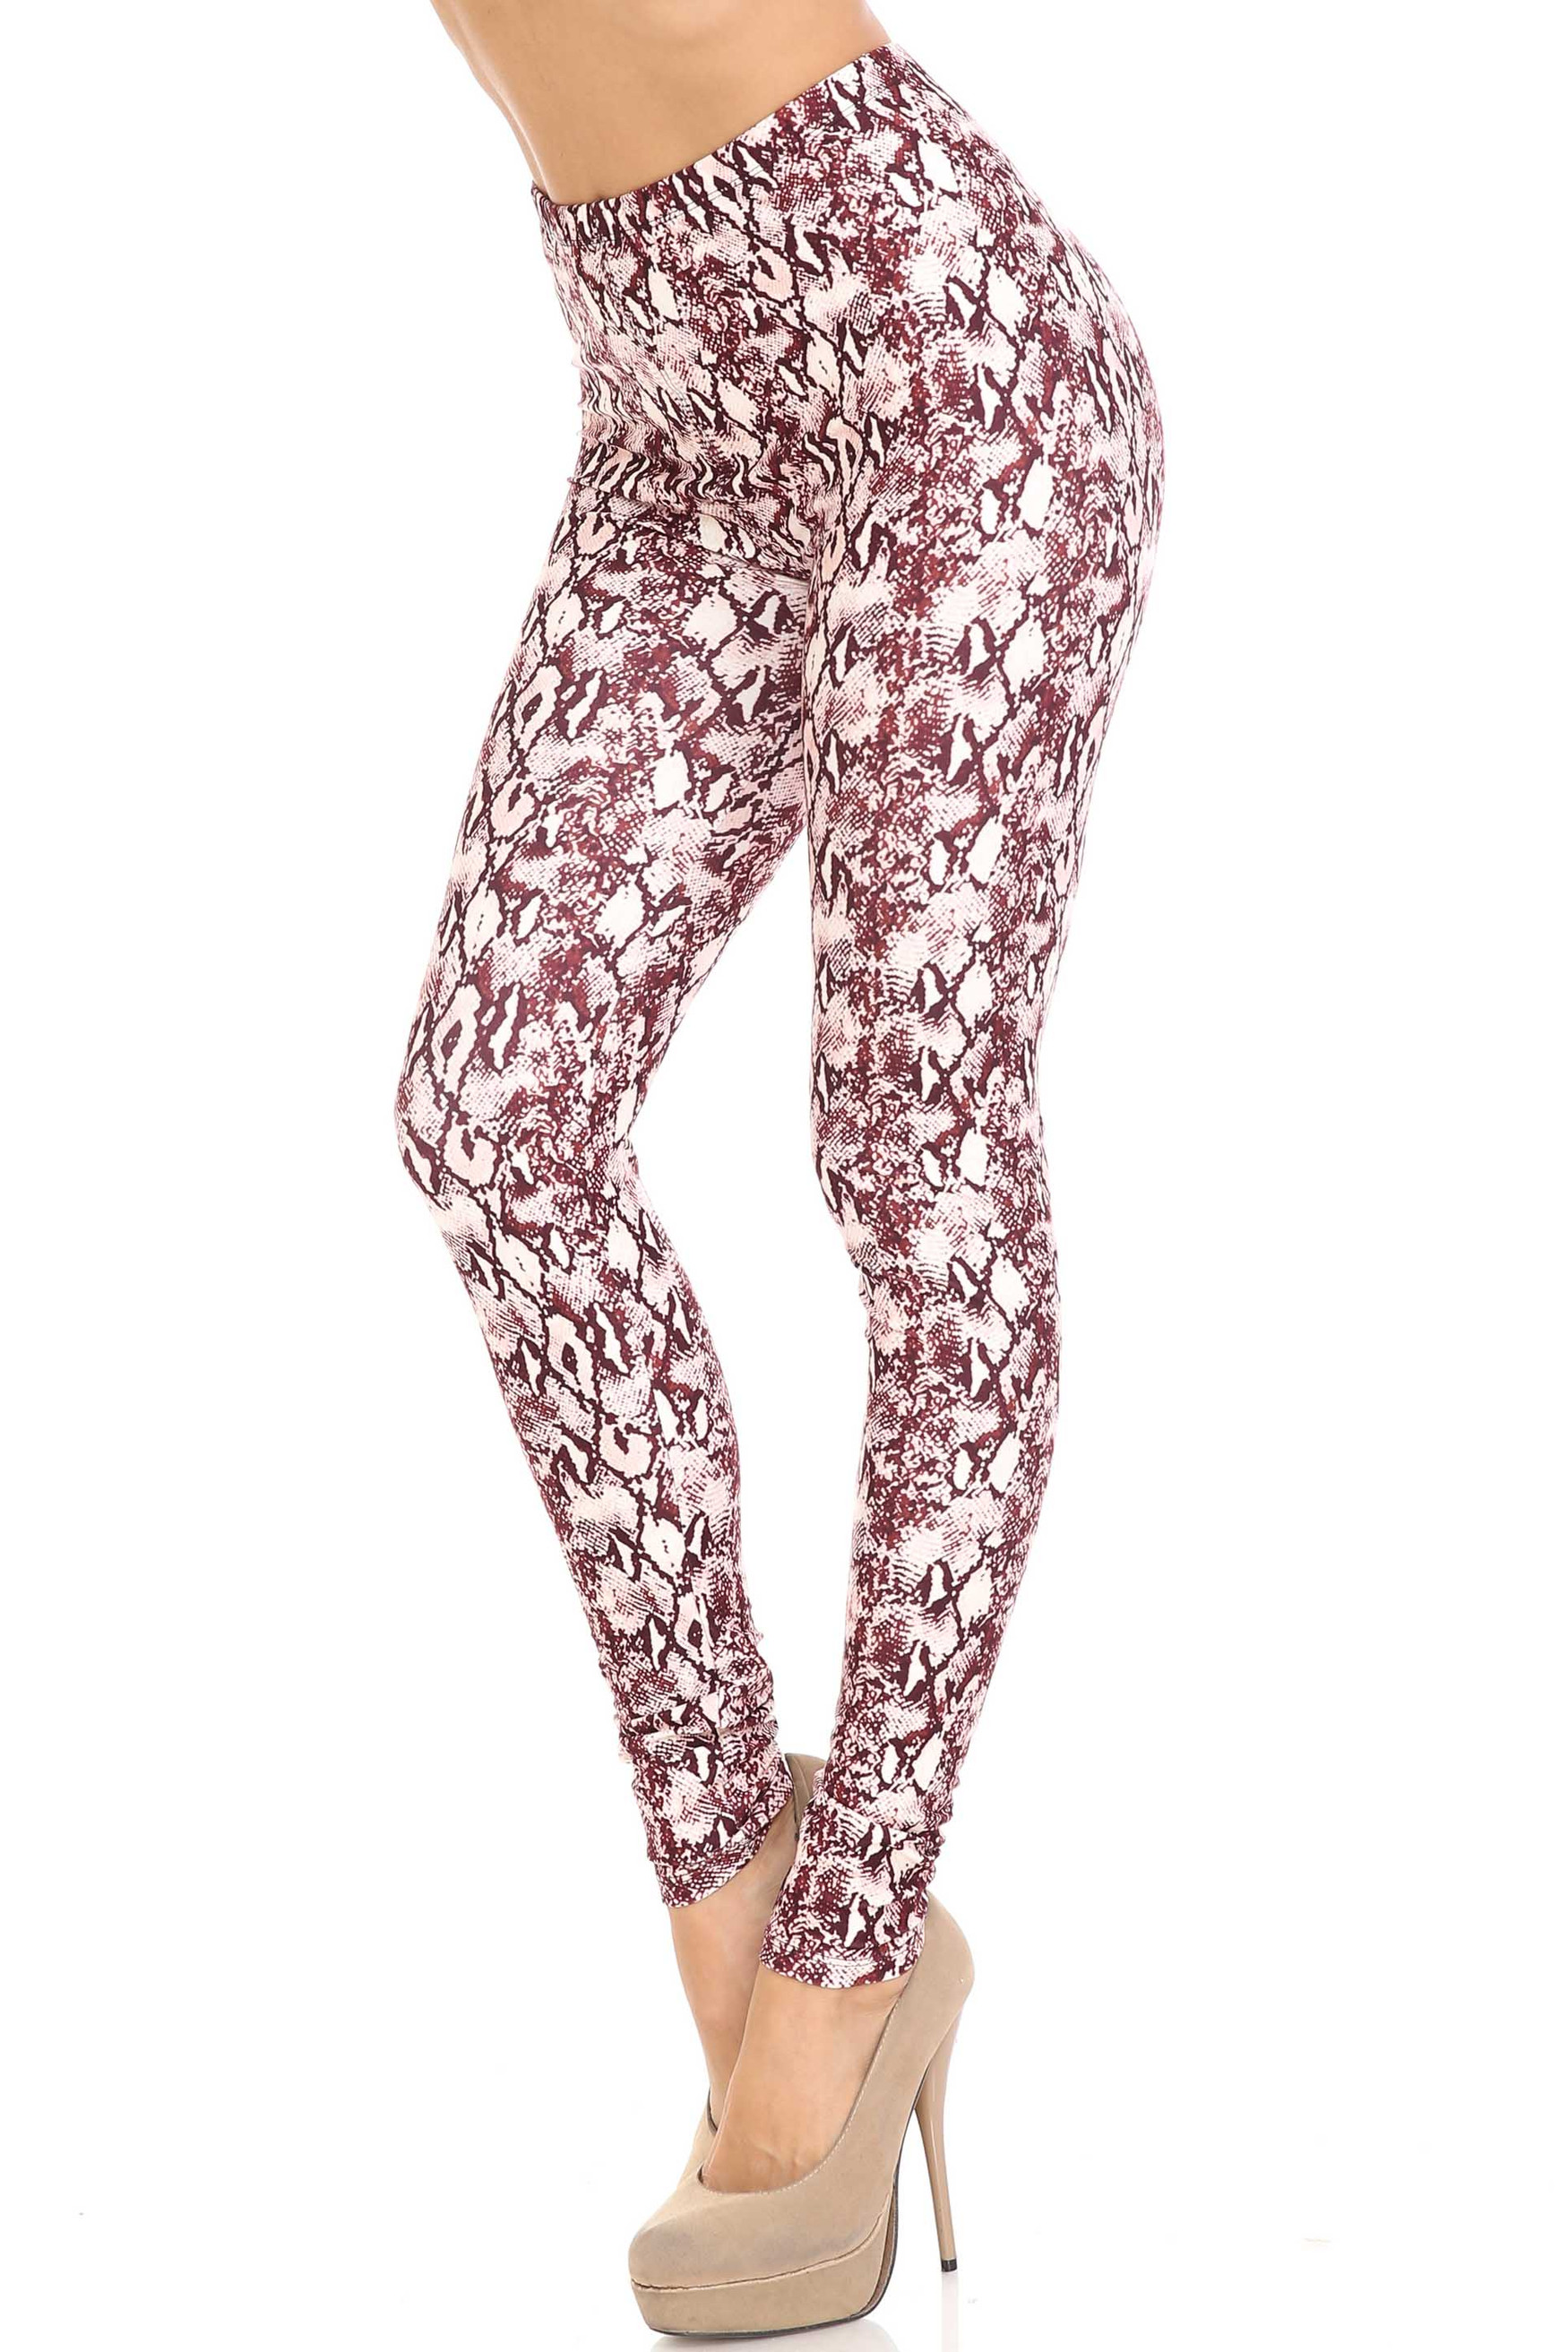 Creamy Soft Crimson Snakeskin Plus Size Leggings - USA Fashion™